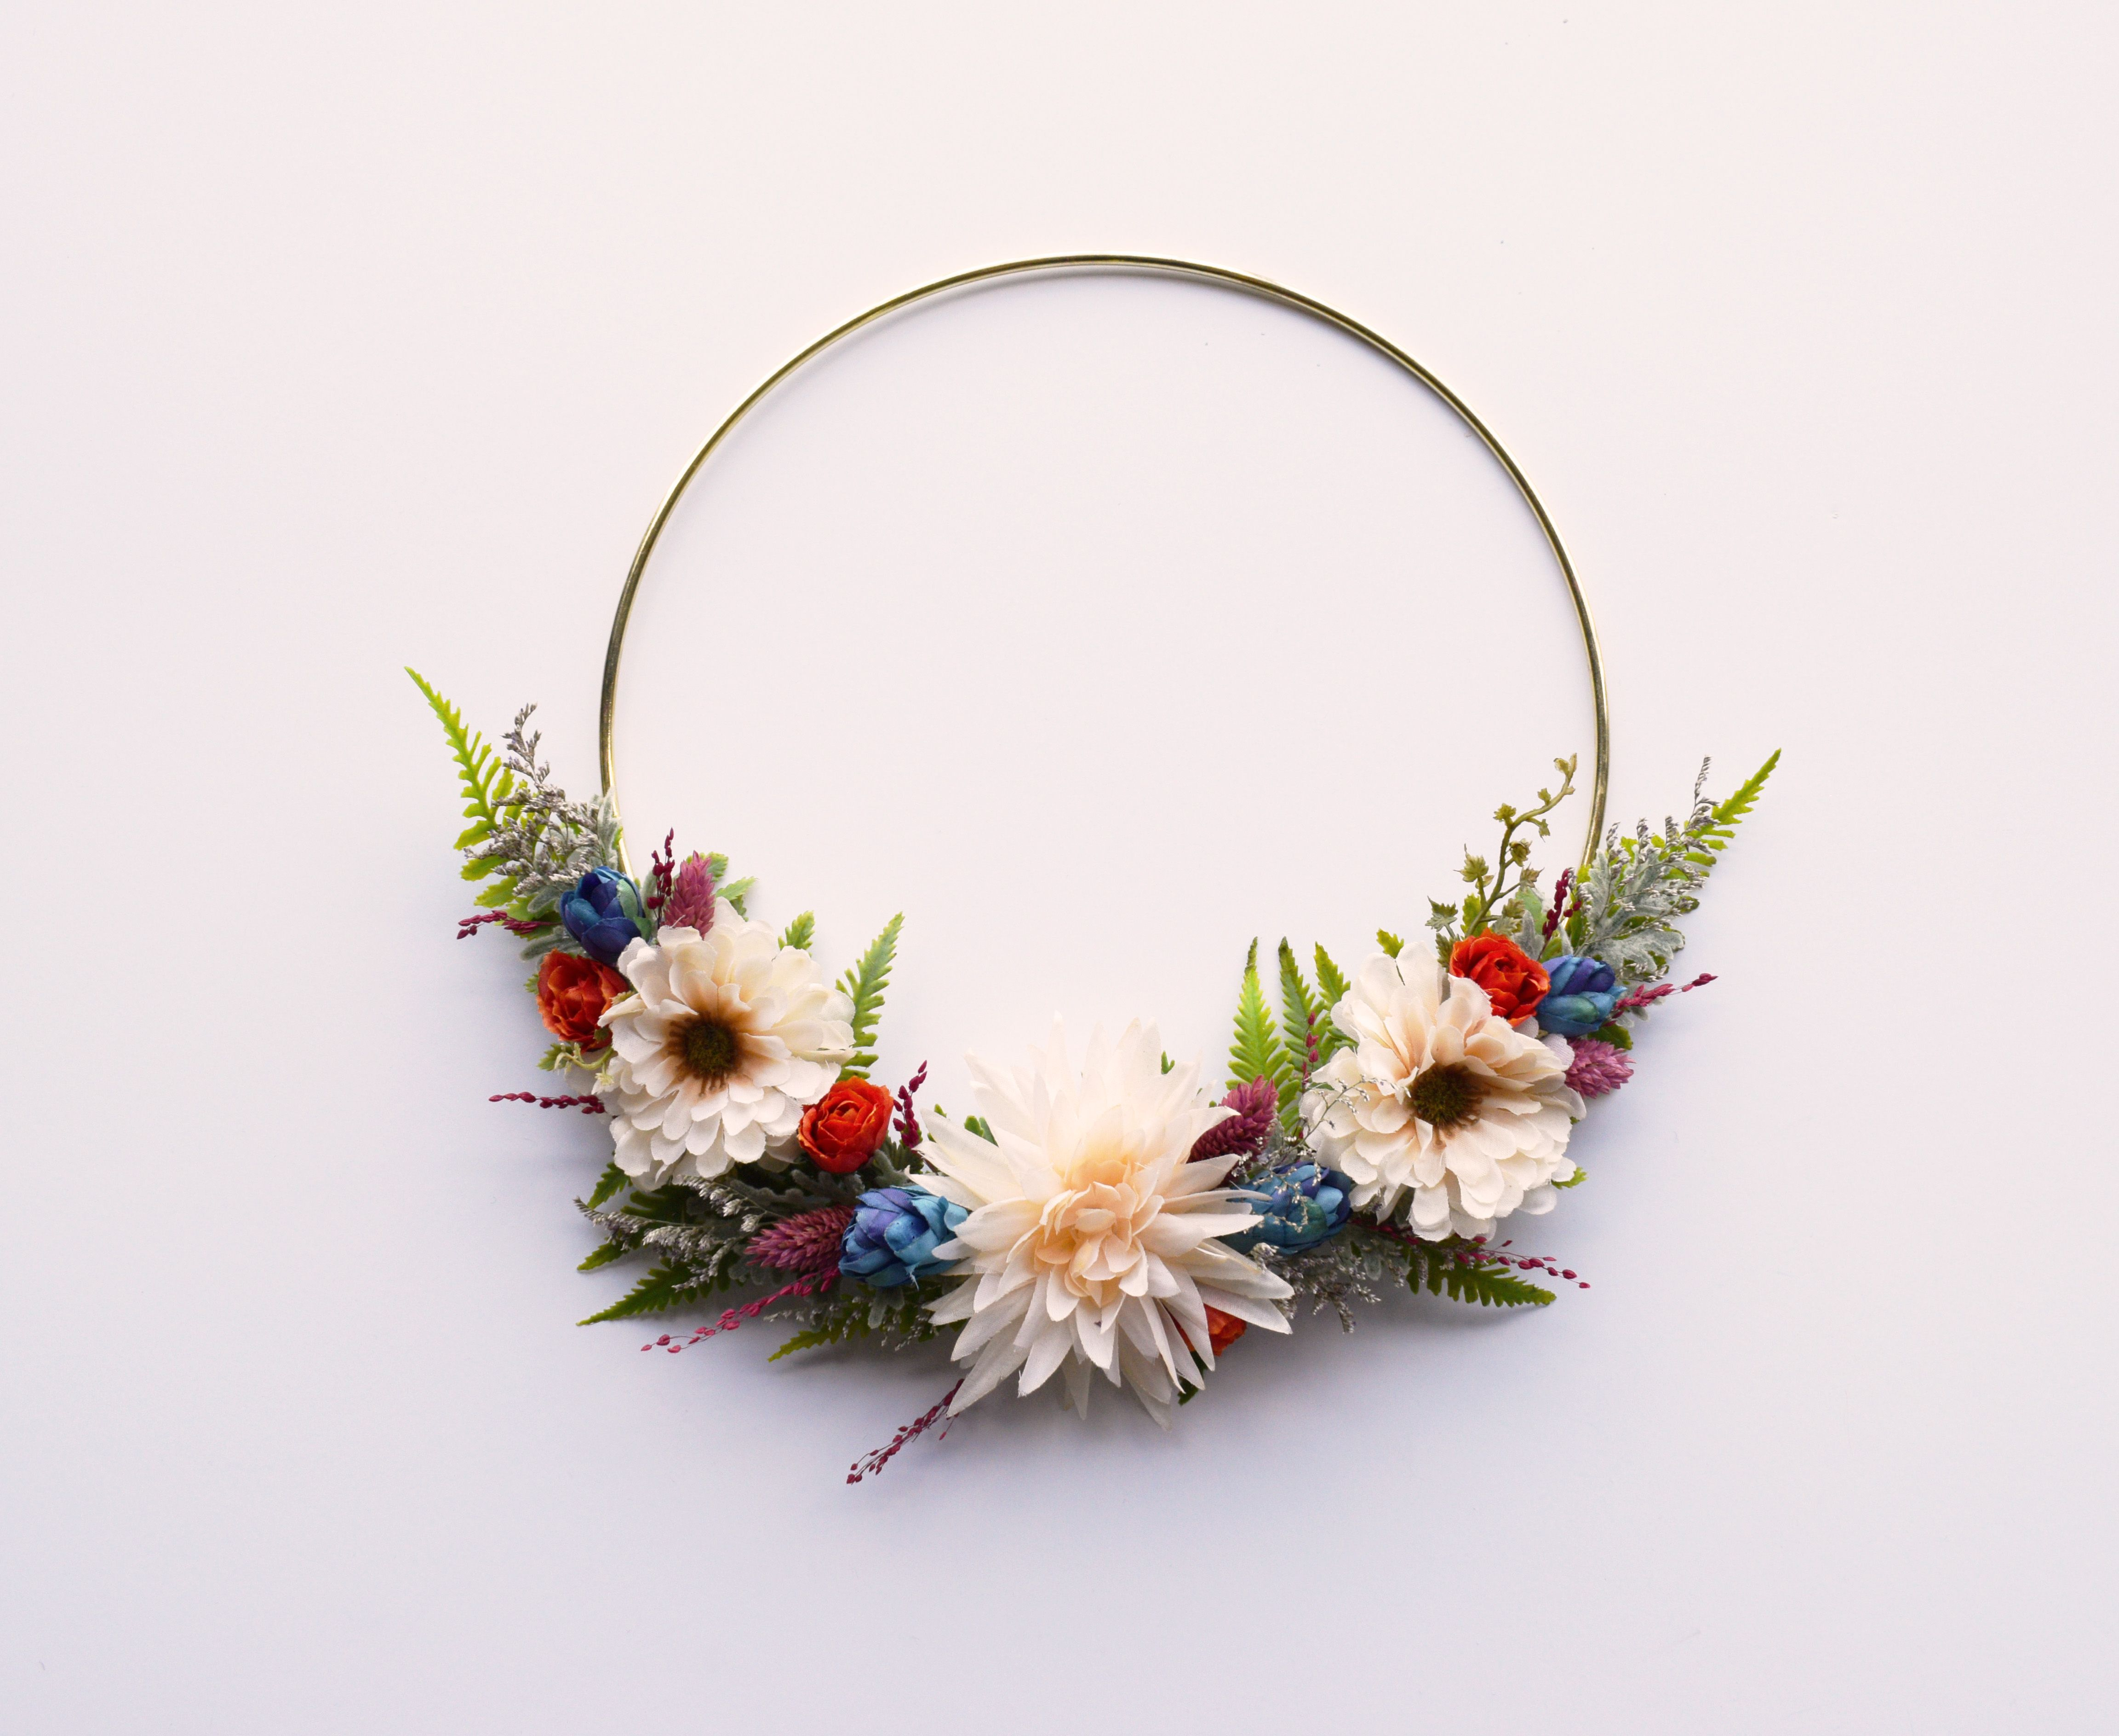 Dried flower wreath wedding modern gift home decor daisy